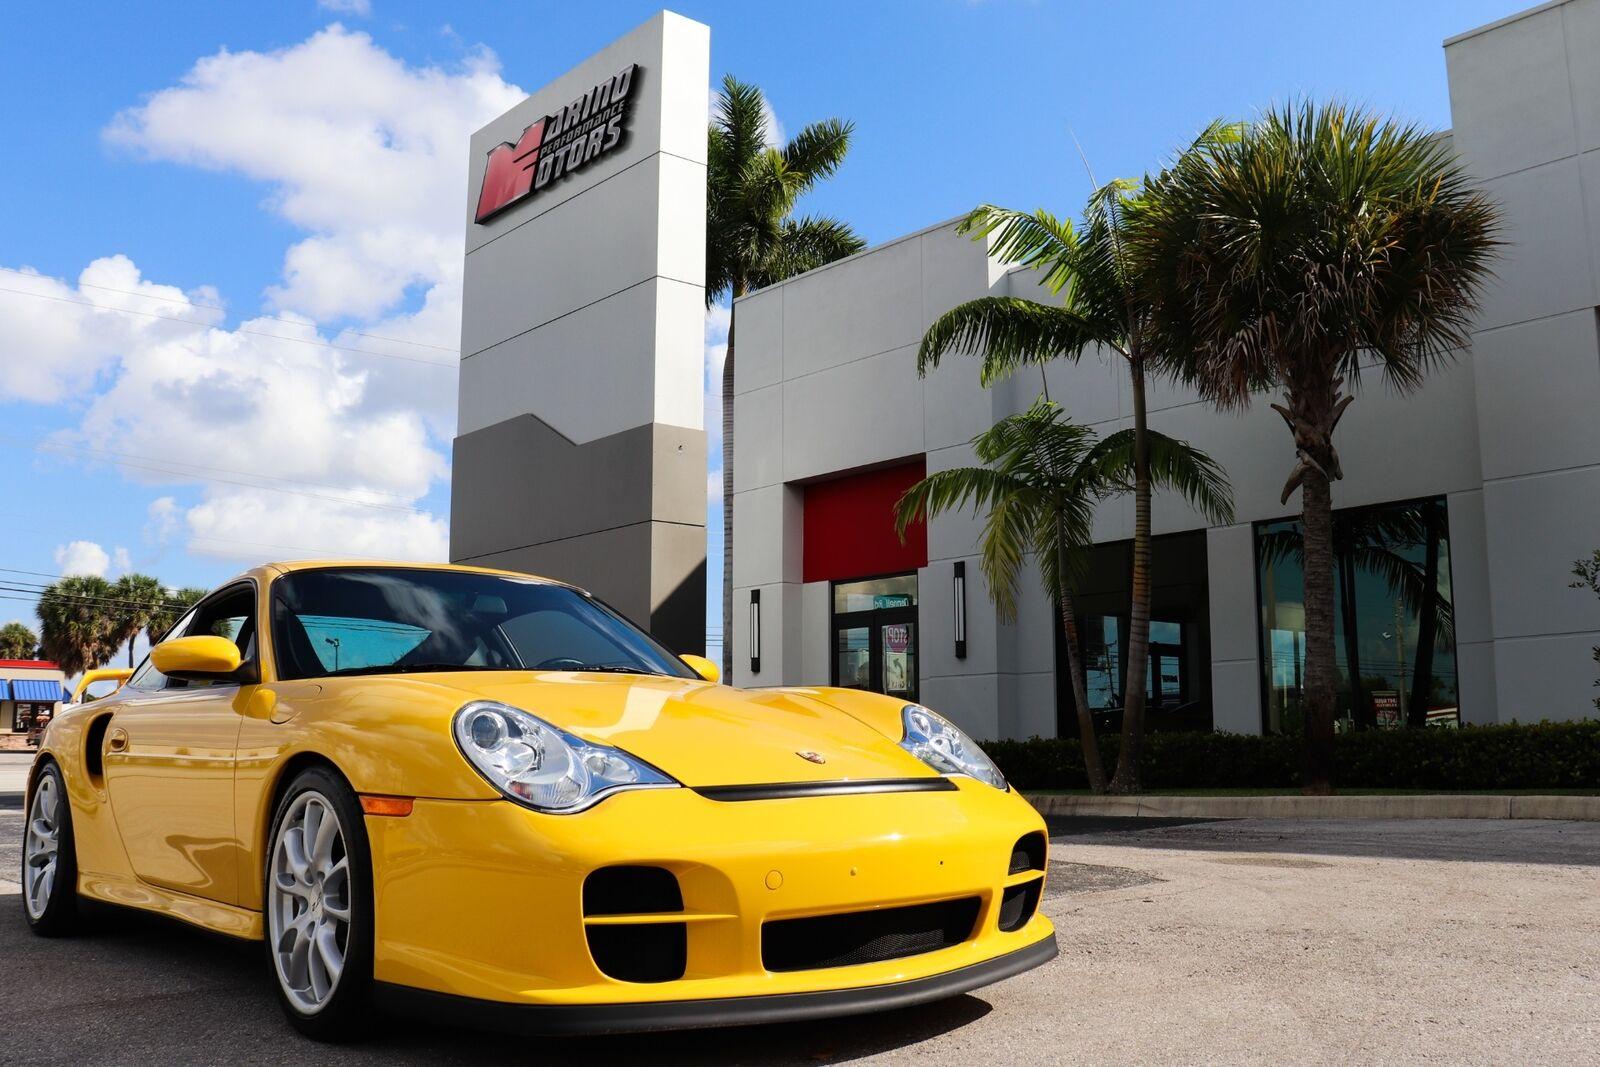 2004 Porsche 911 GT2 - RARE 1 OF 4 SPEED YELLOW - 8,141 MILES